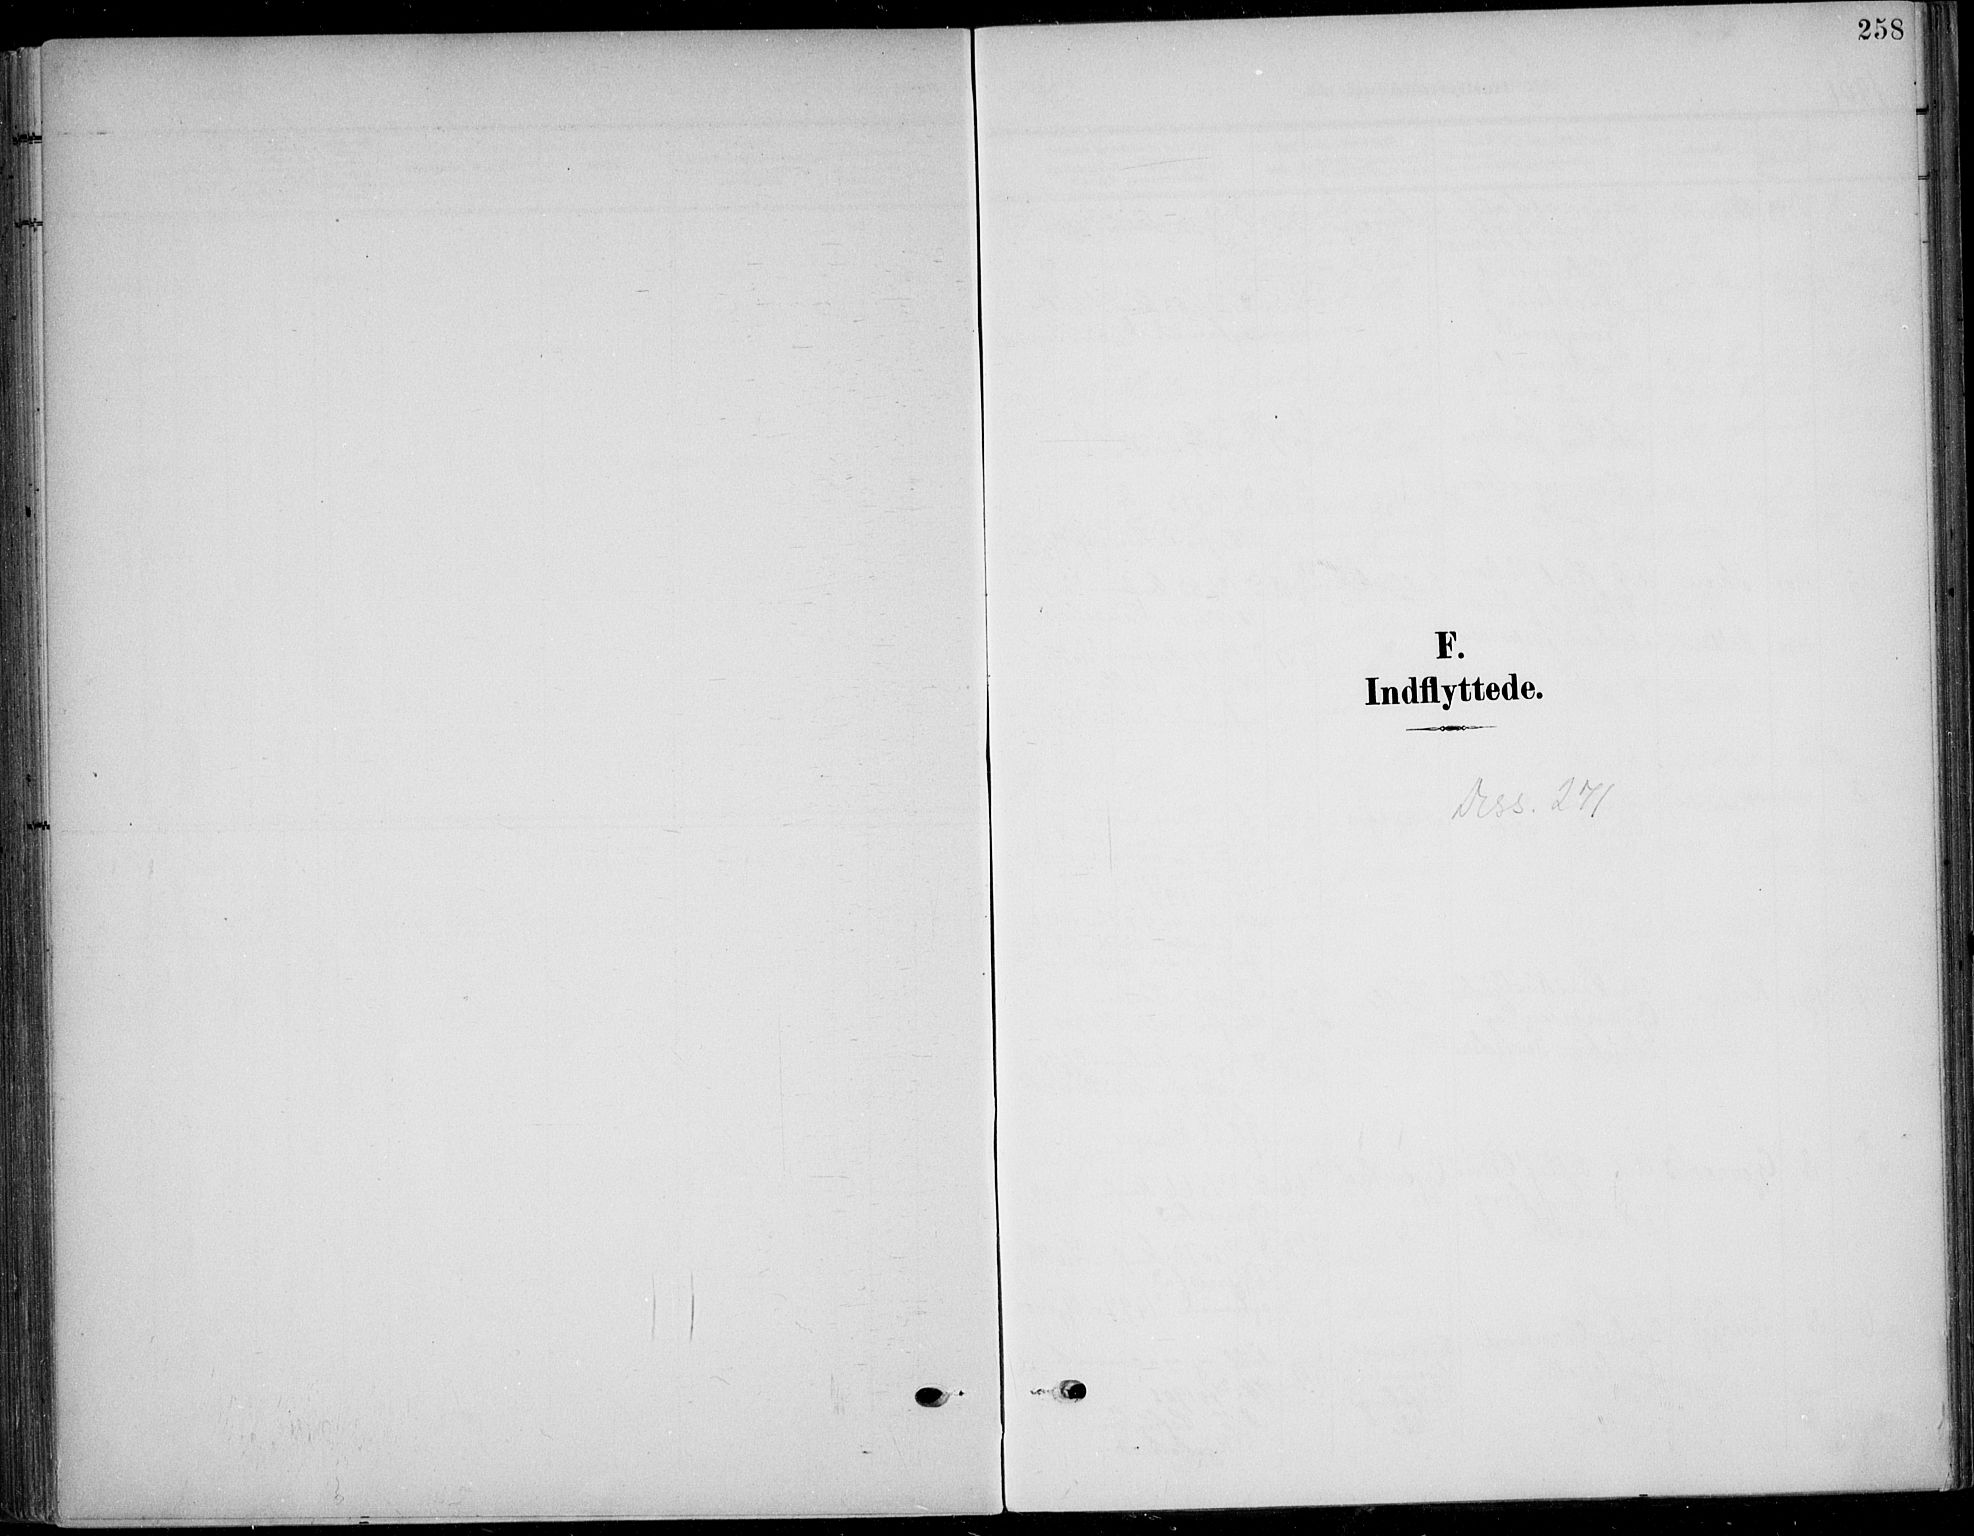 SAKO, Solum kirkebøker, F/Fb/L0003: Ministerialbok nr. II 3, 1901-1912, s. 258